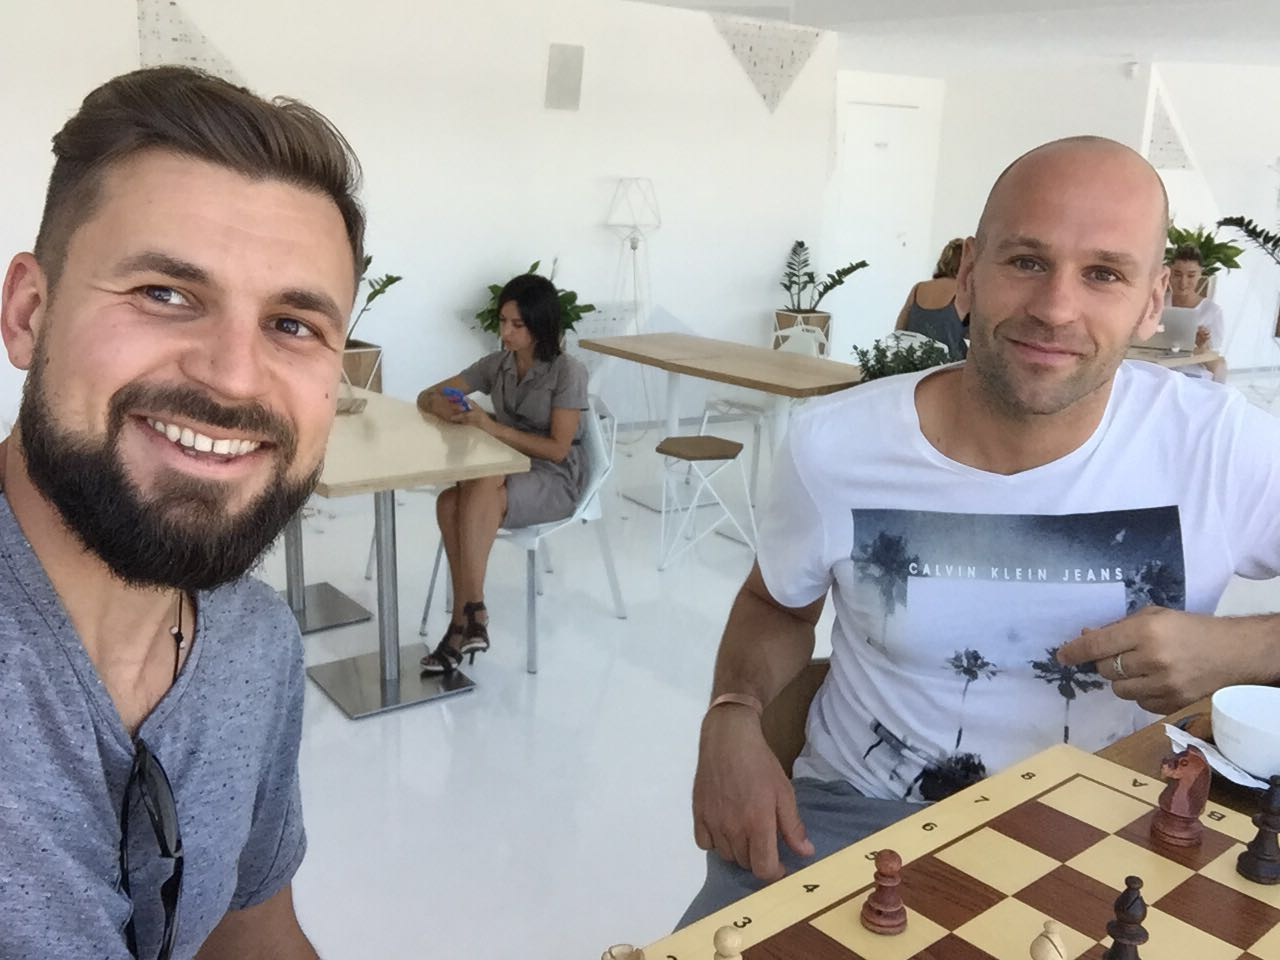 Peter Santenello and his Ukrainian friend